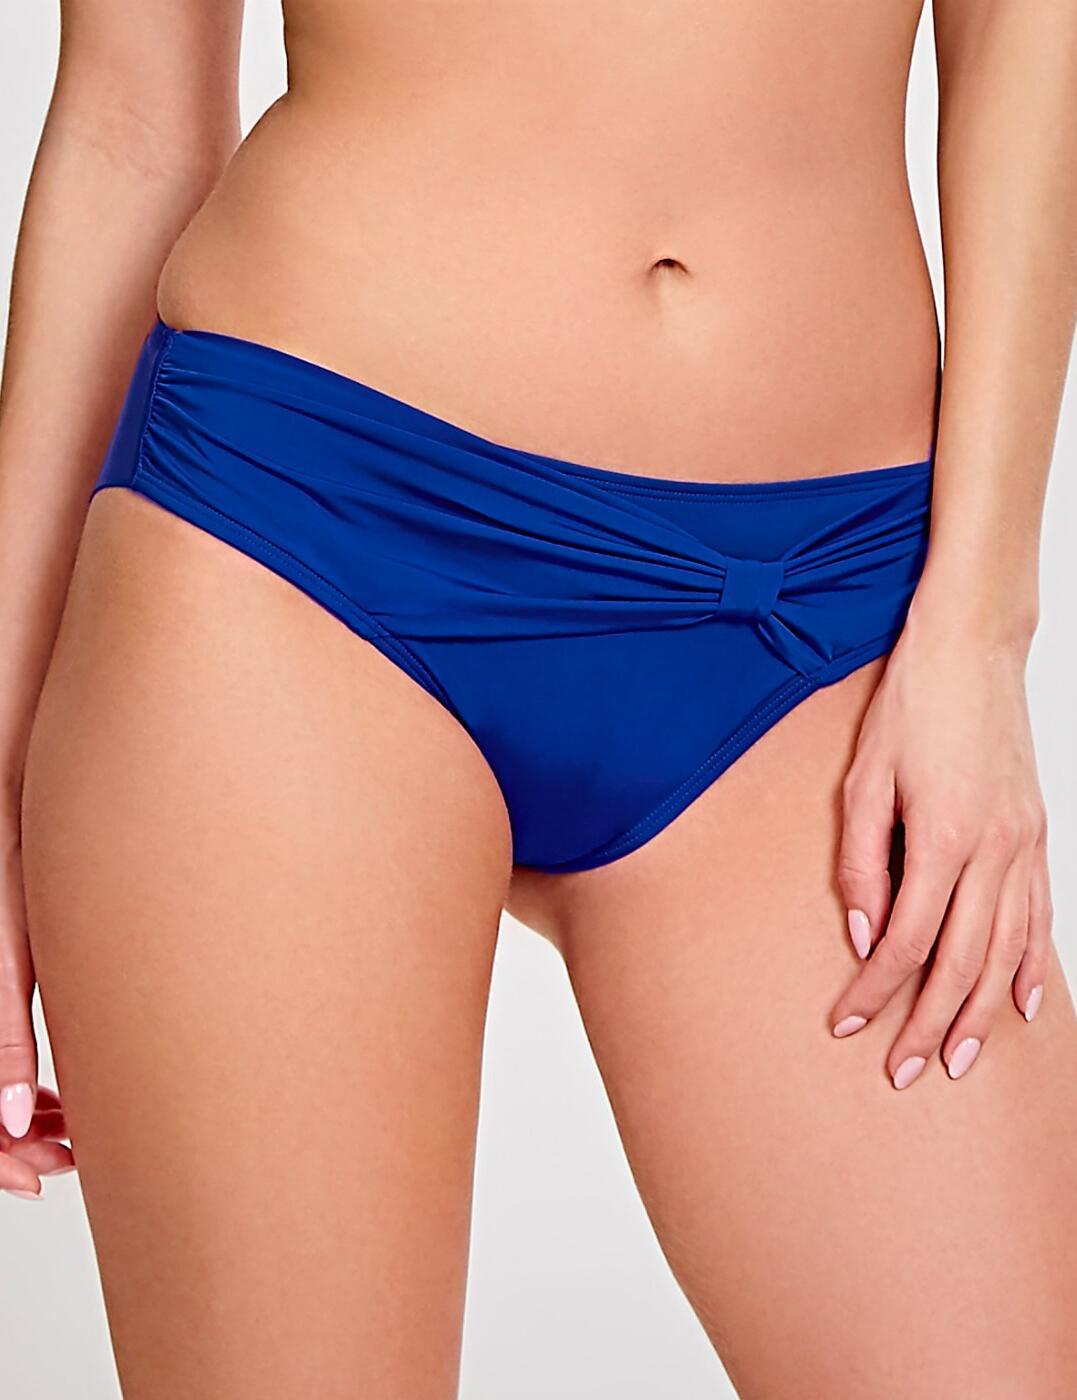 SW0836 Panache Marina Brazilian Bikini Brief - SW0836 Cobalt